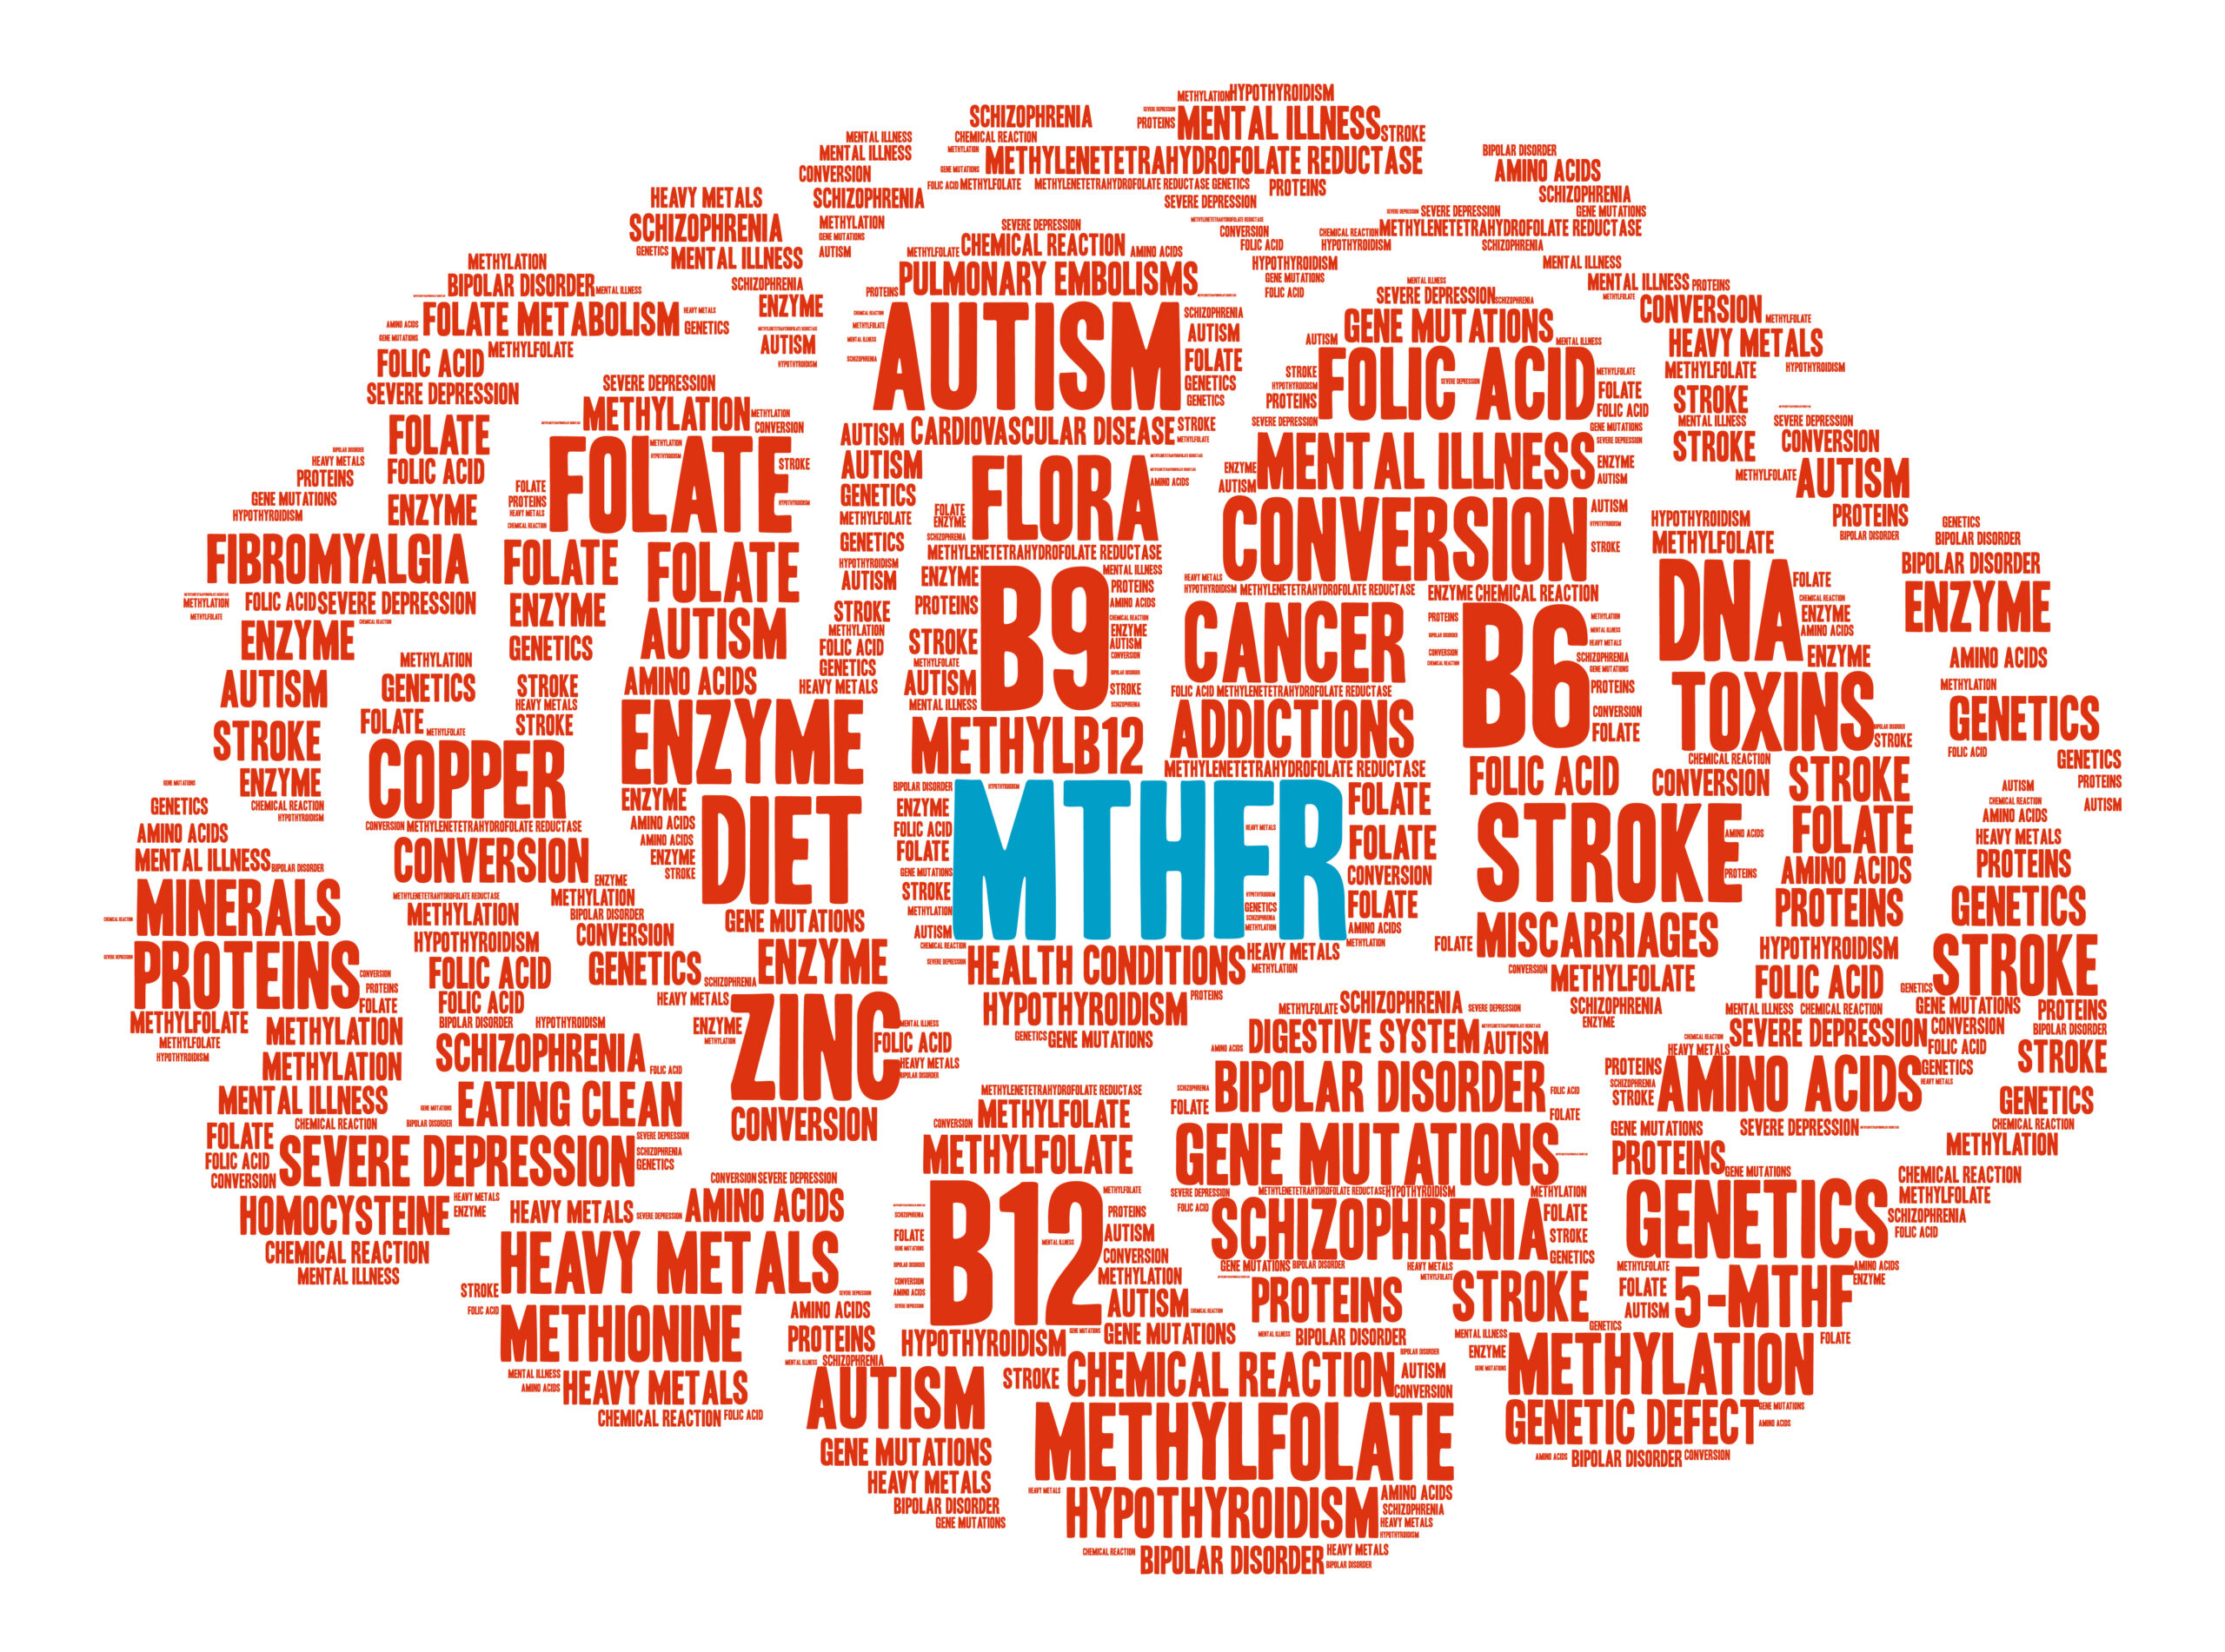 MTHFR Mutation: Symptoms And Treatments